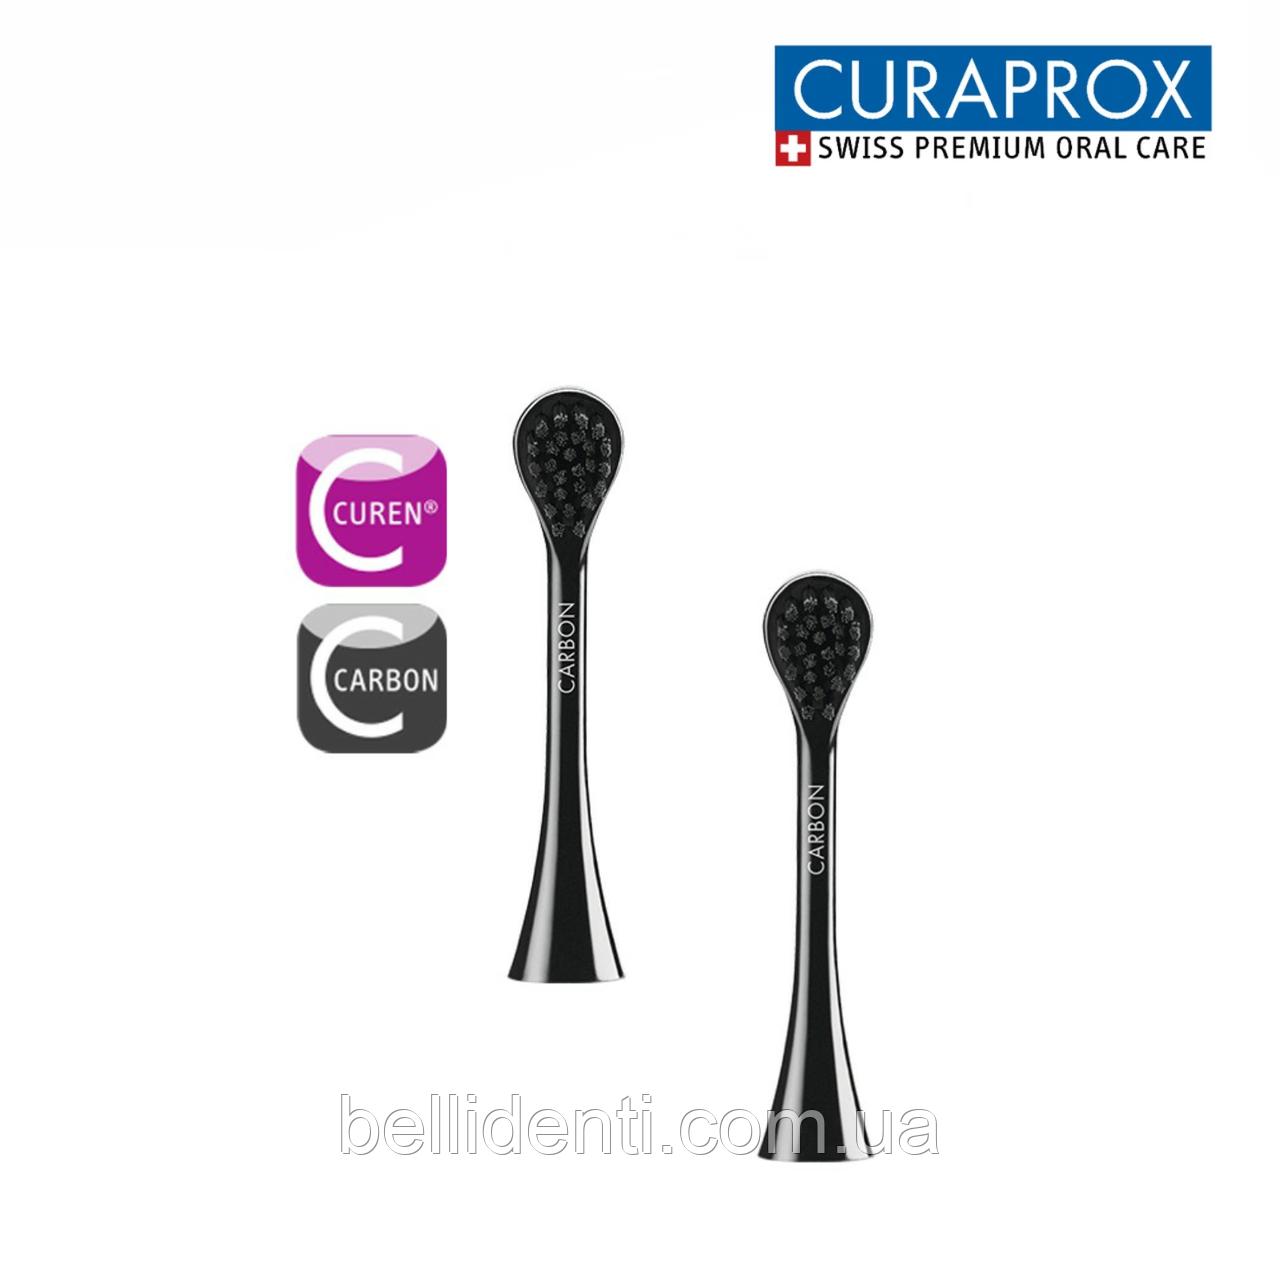 Насадки Curaprox CARBON для звуковой зубной щетки Hydrosonic Black is White, 2 шт